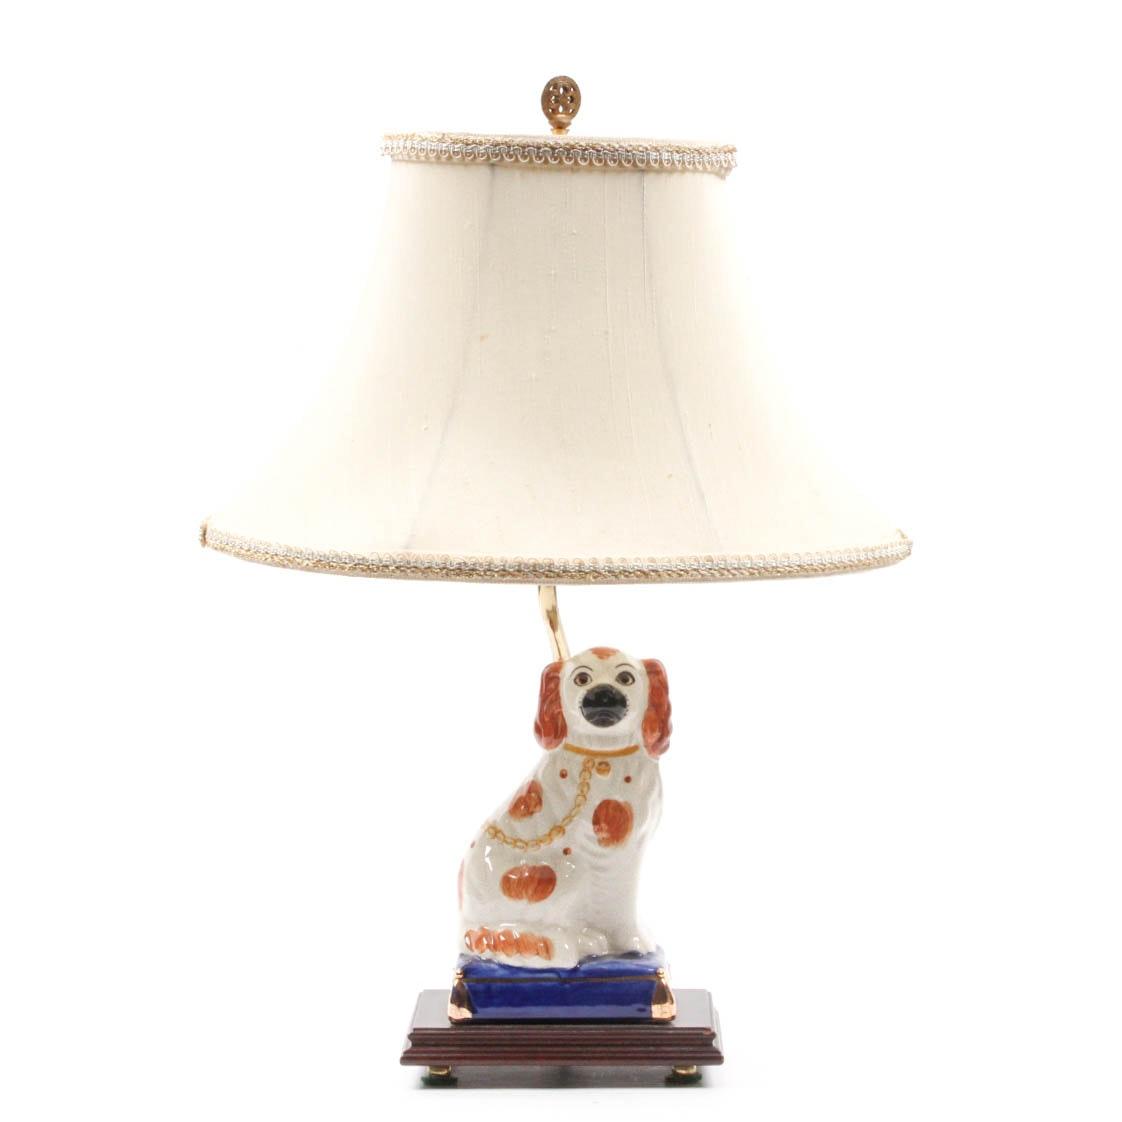 Staffordshire Style Ceramic Spaniel Lamp